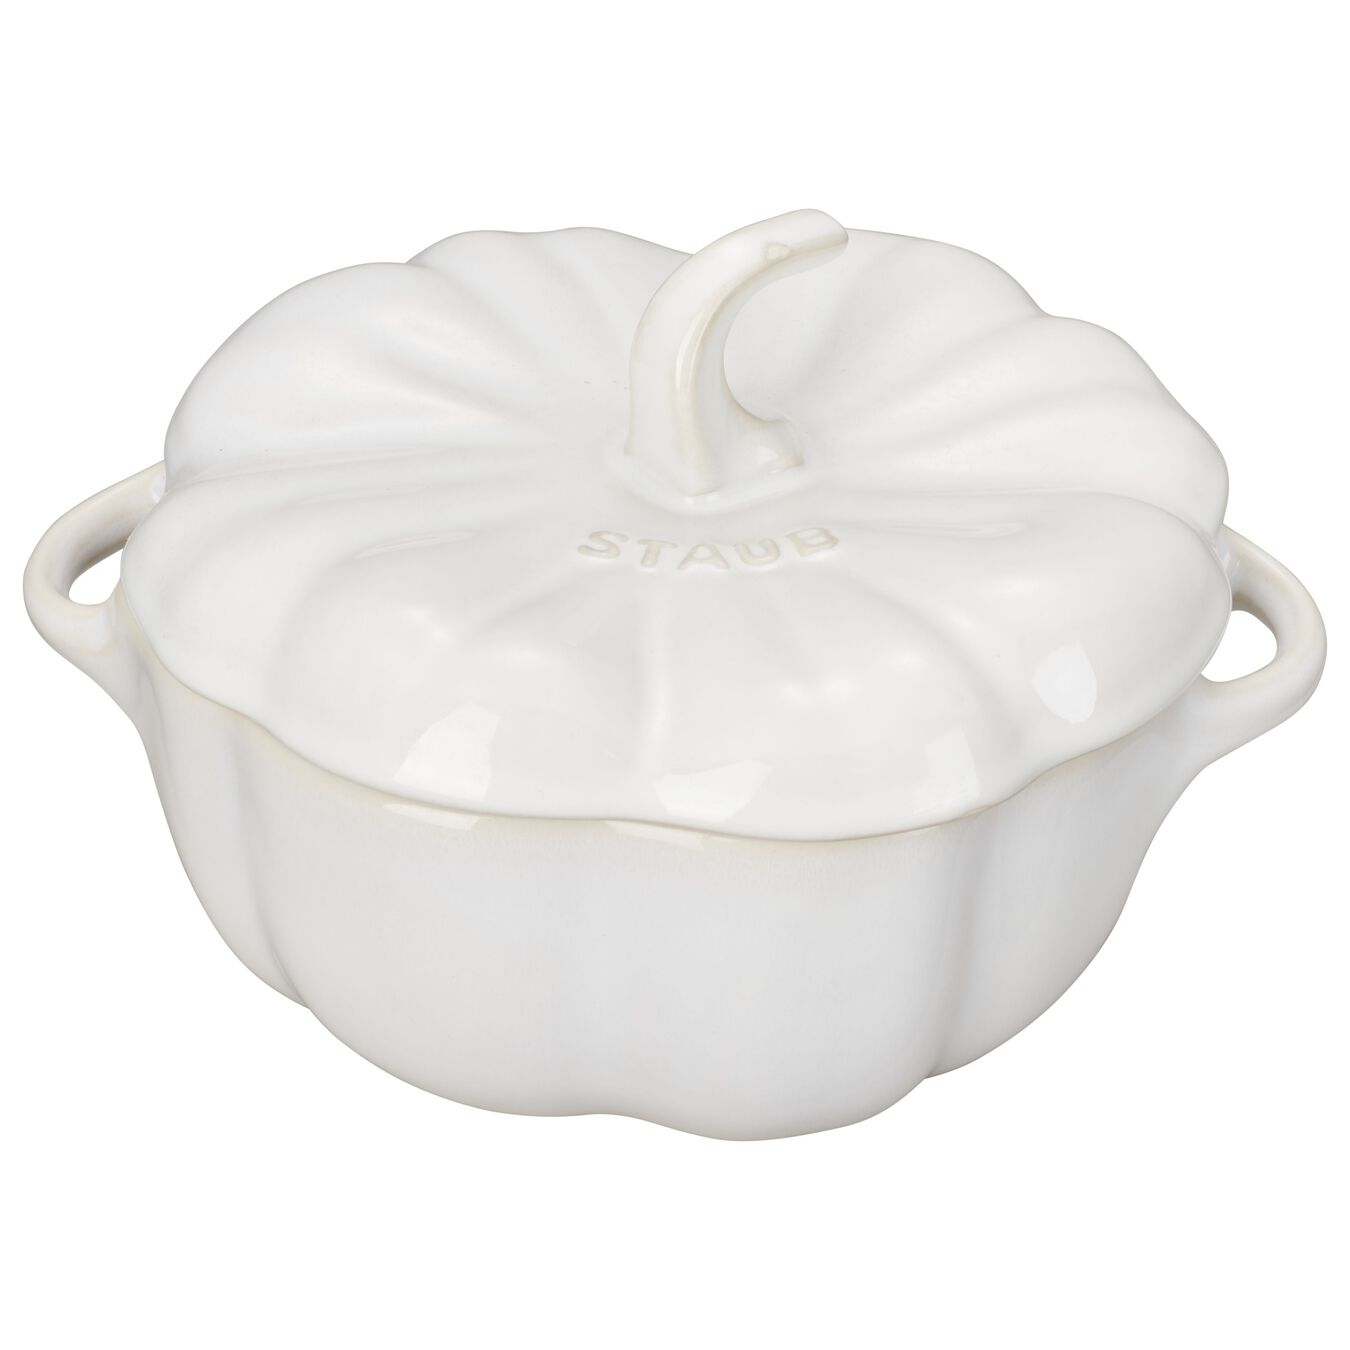 700 ml Ceramic Citrouille Faitout, Ivory-White,,large 1